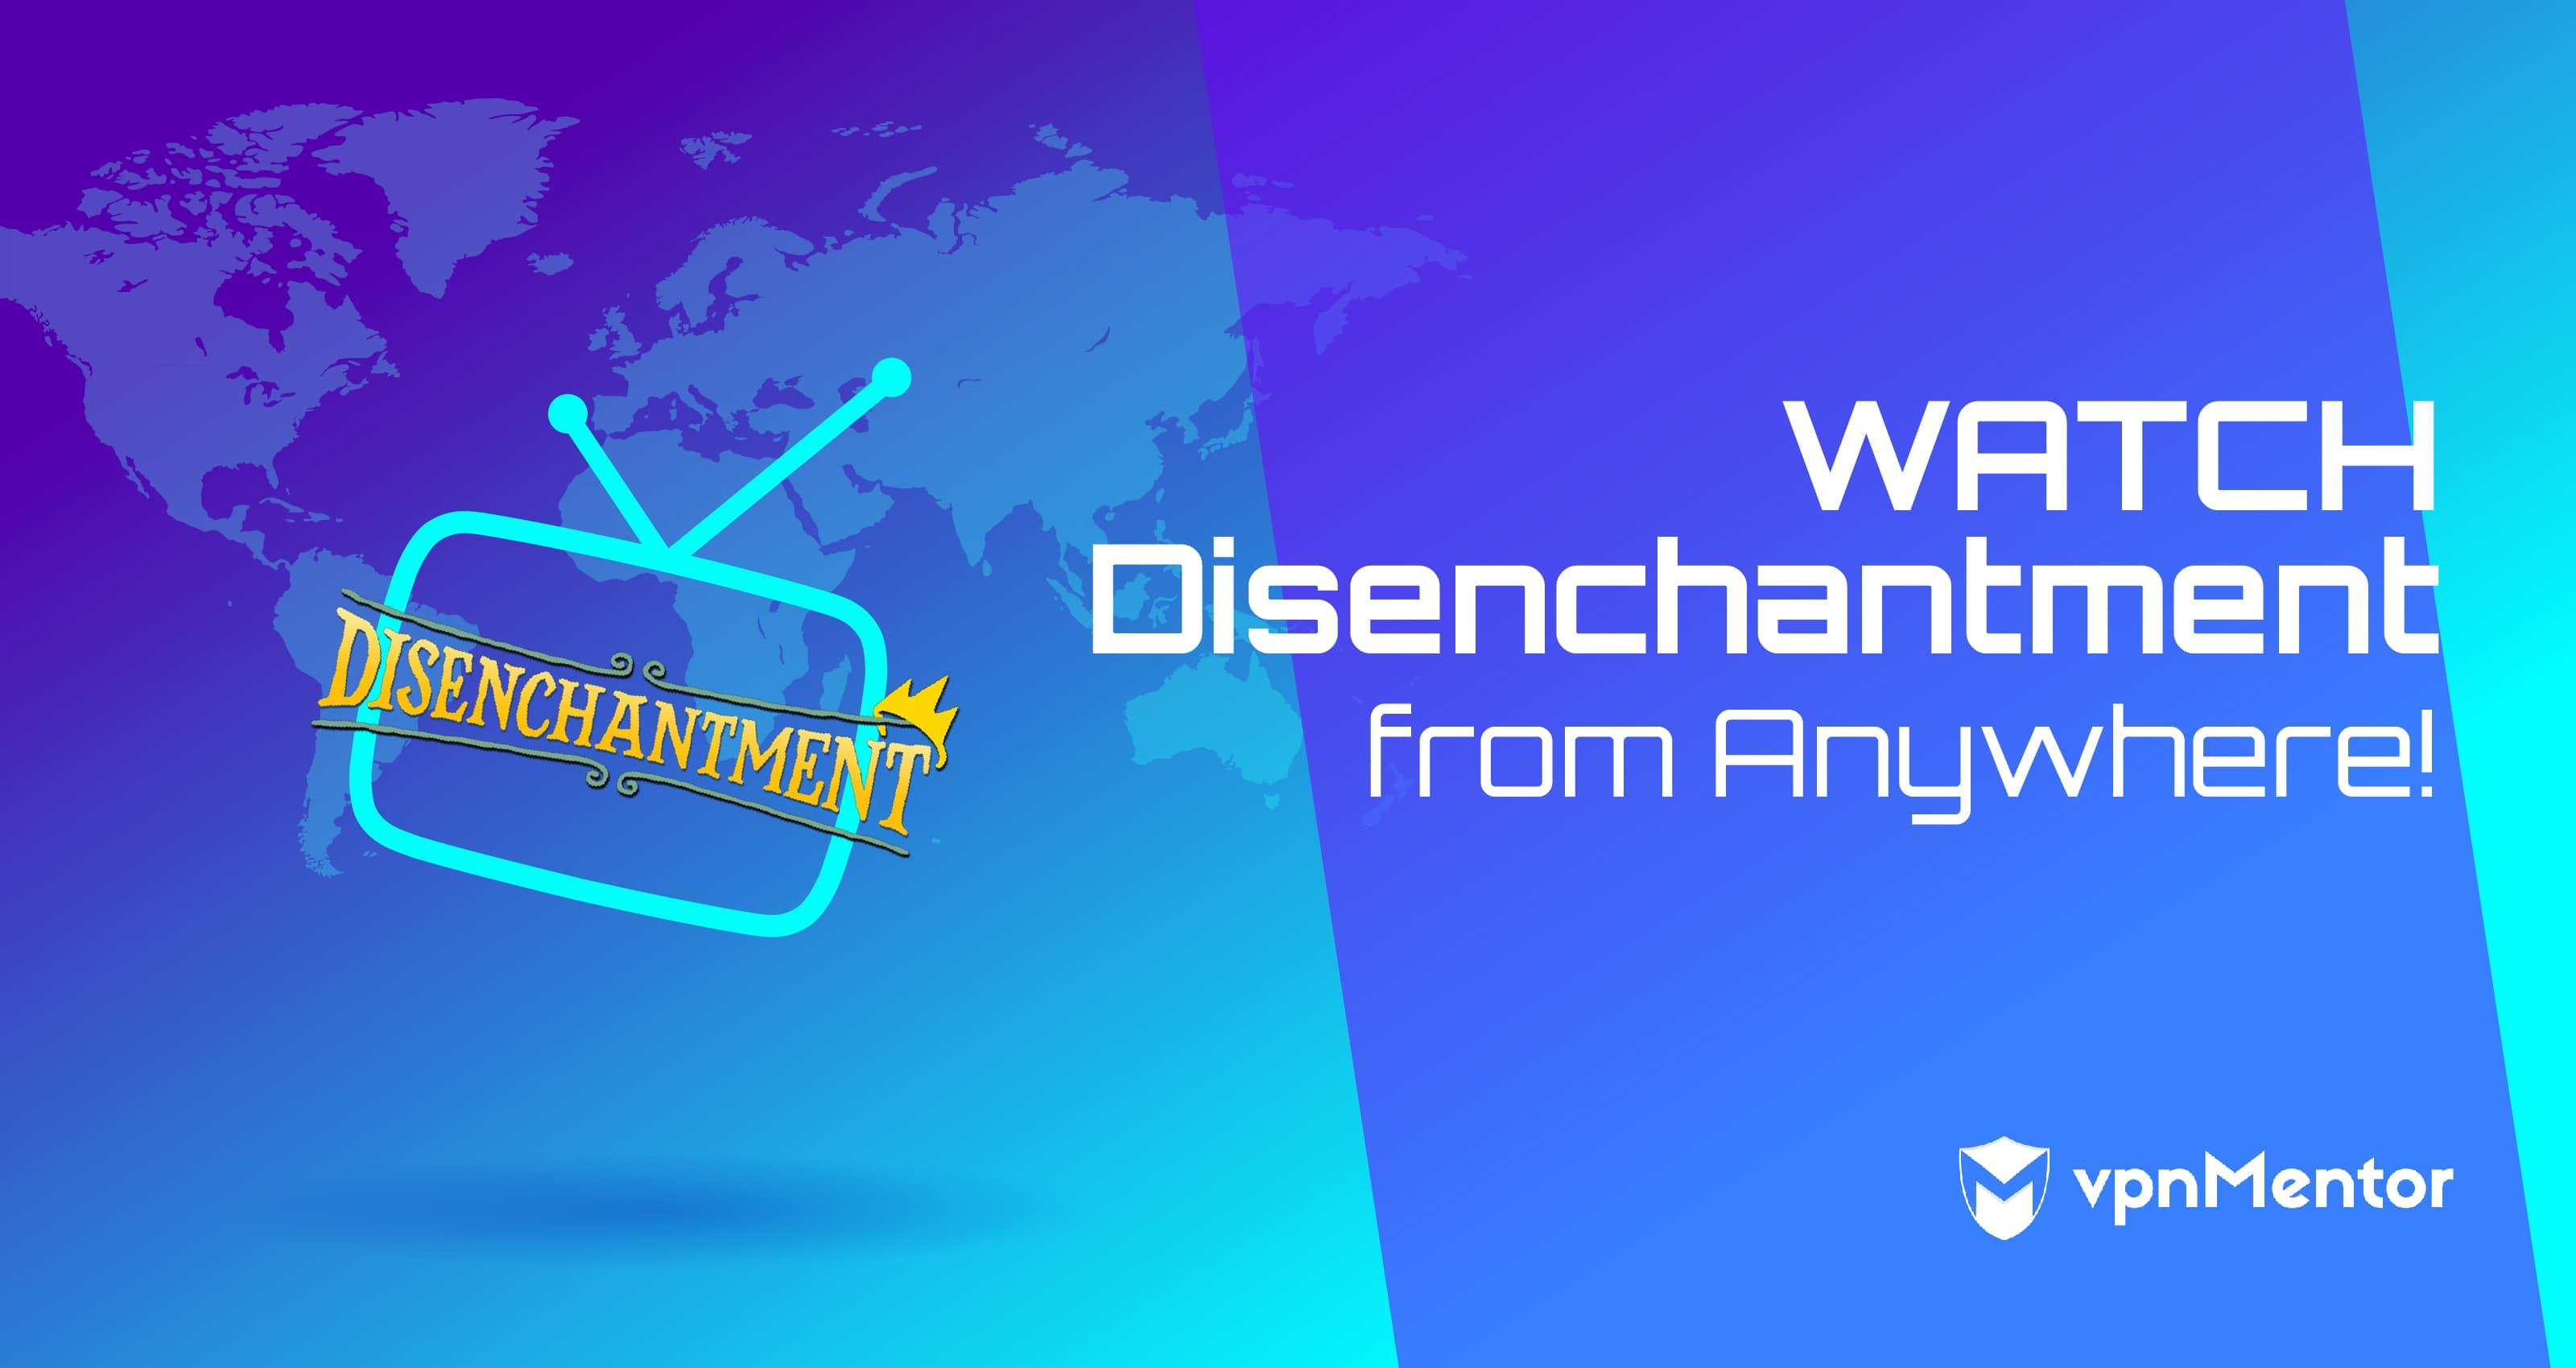 Watch Disenchantment Anywhere